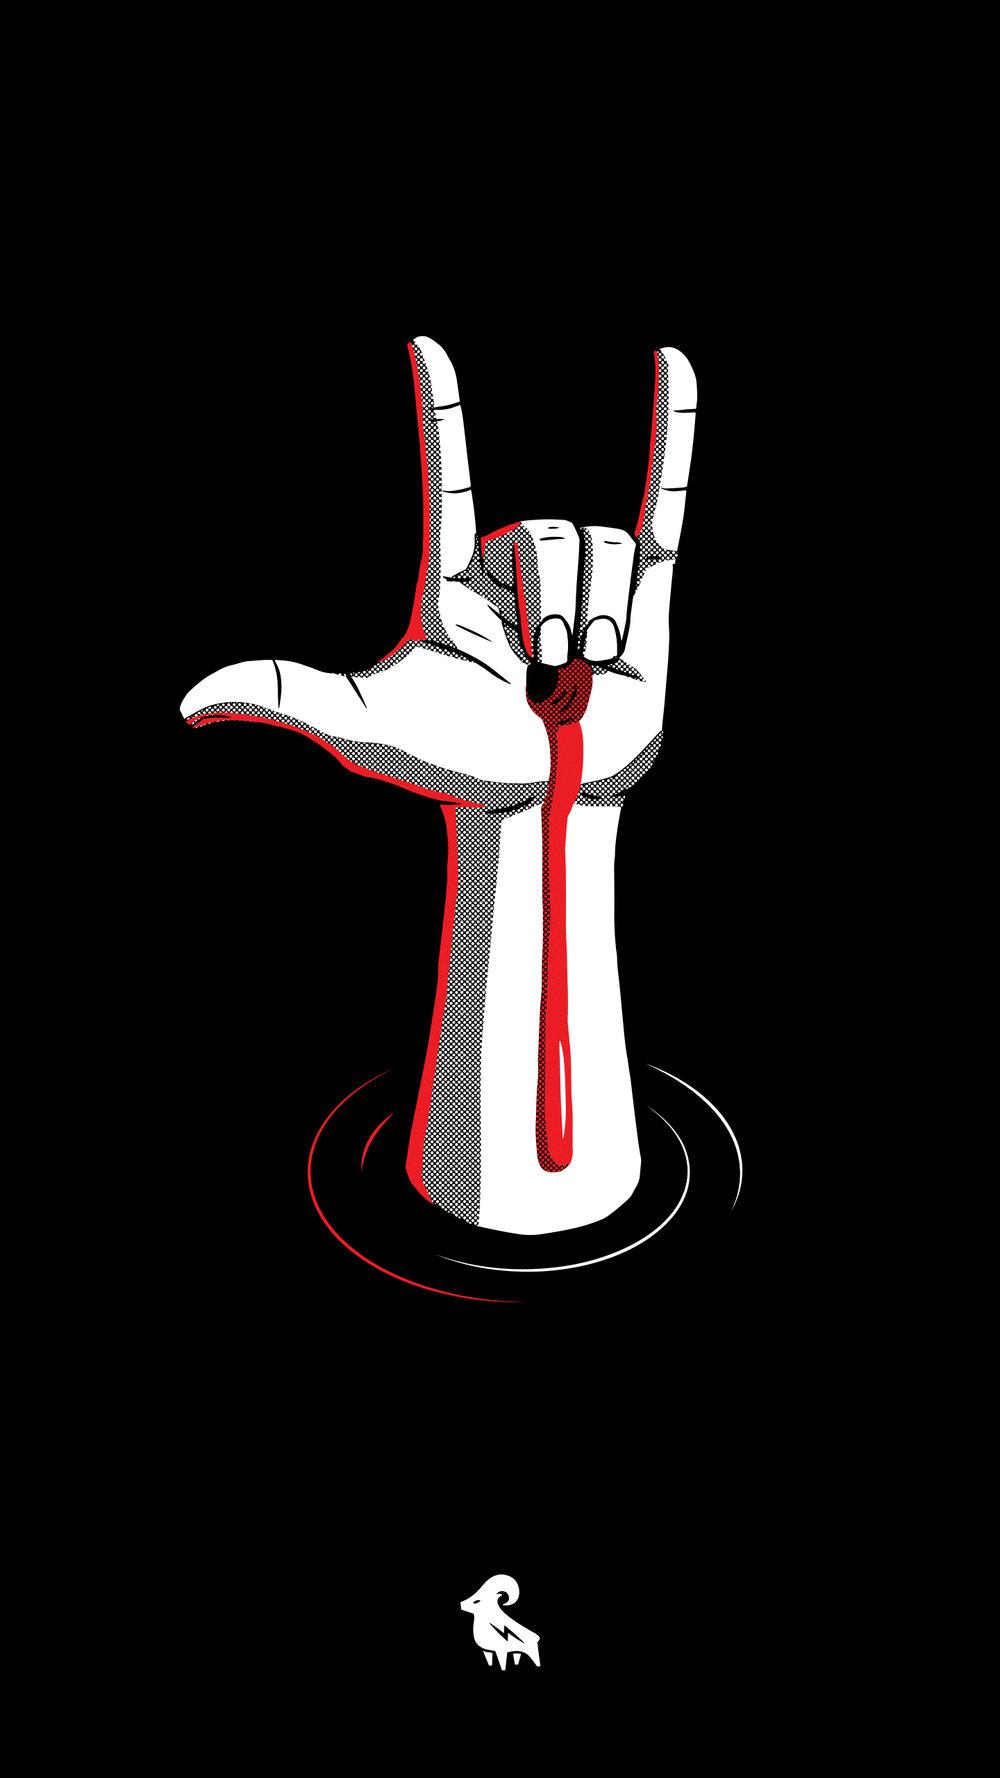 03_hand_Galaxy-s7.jpg